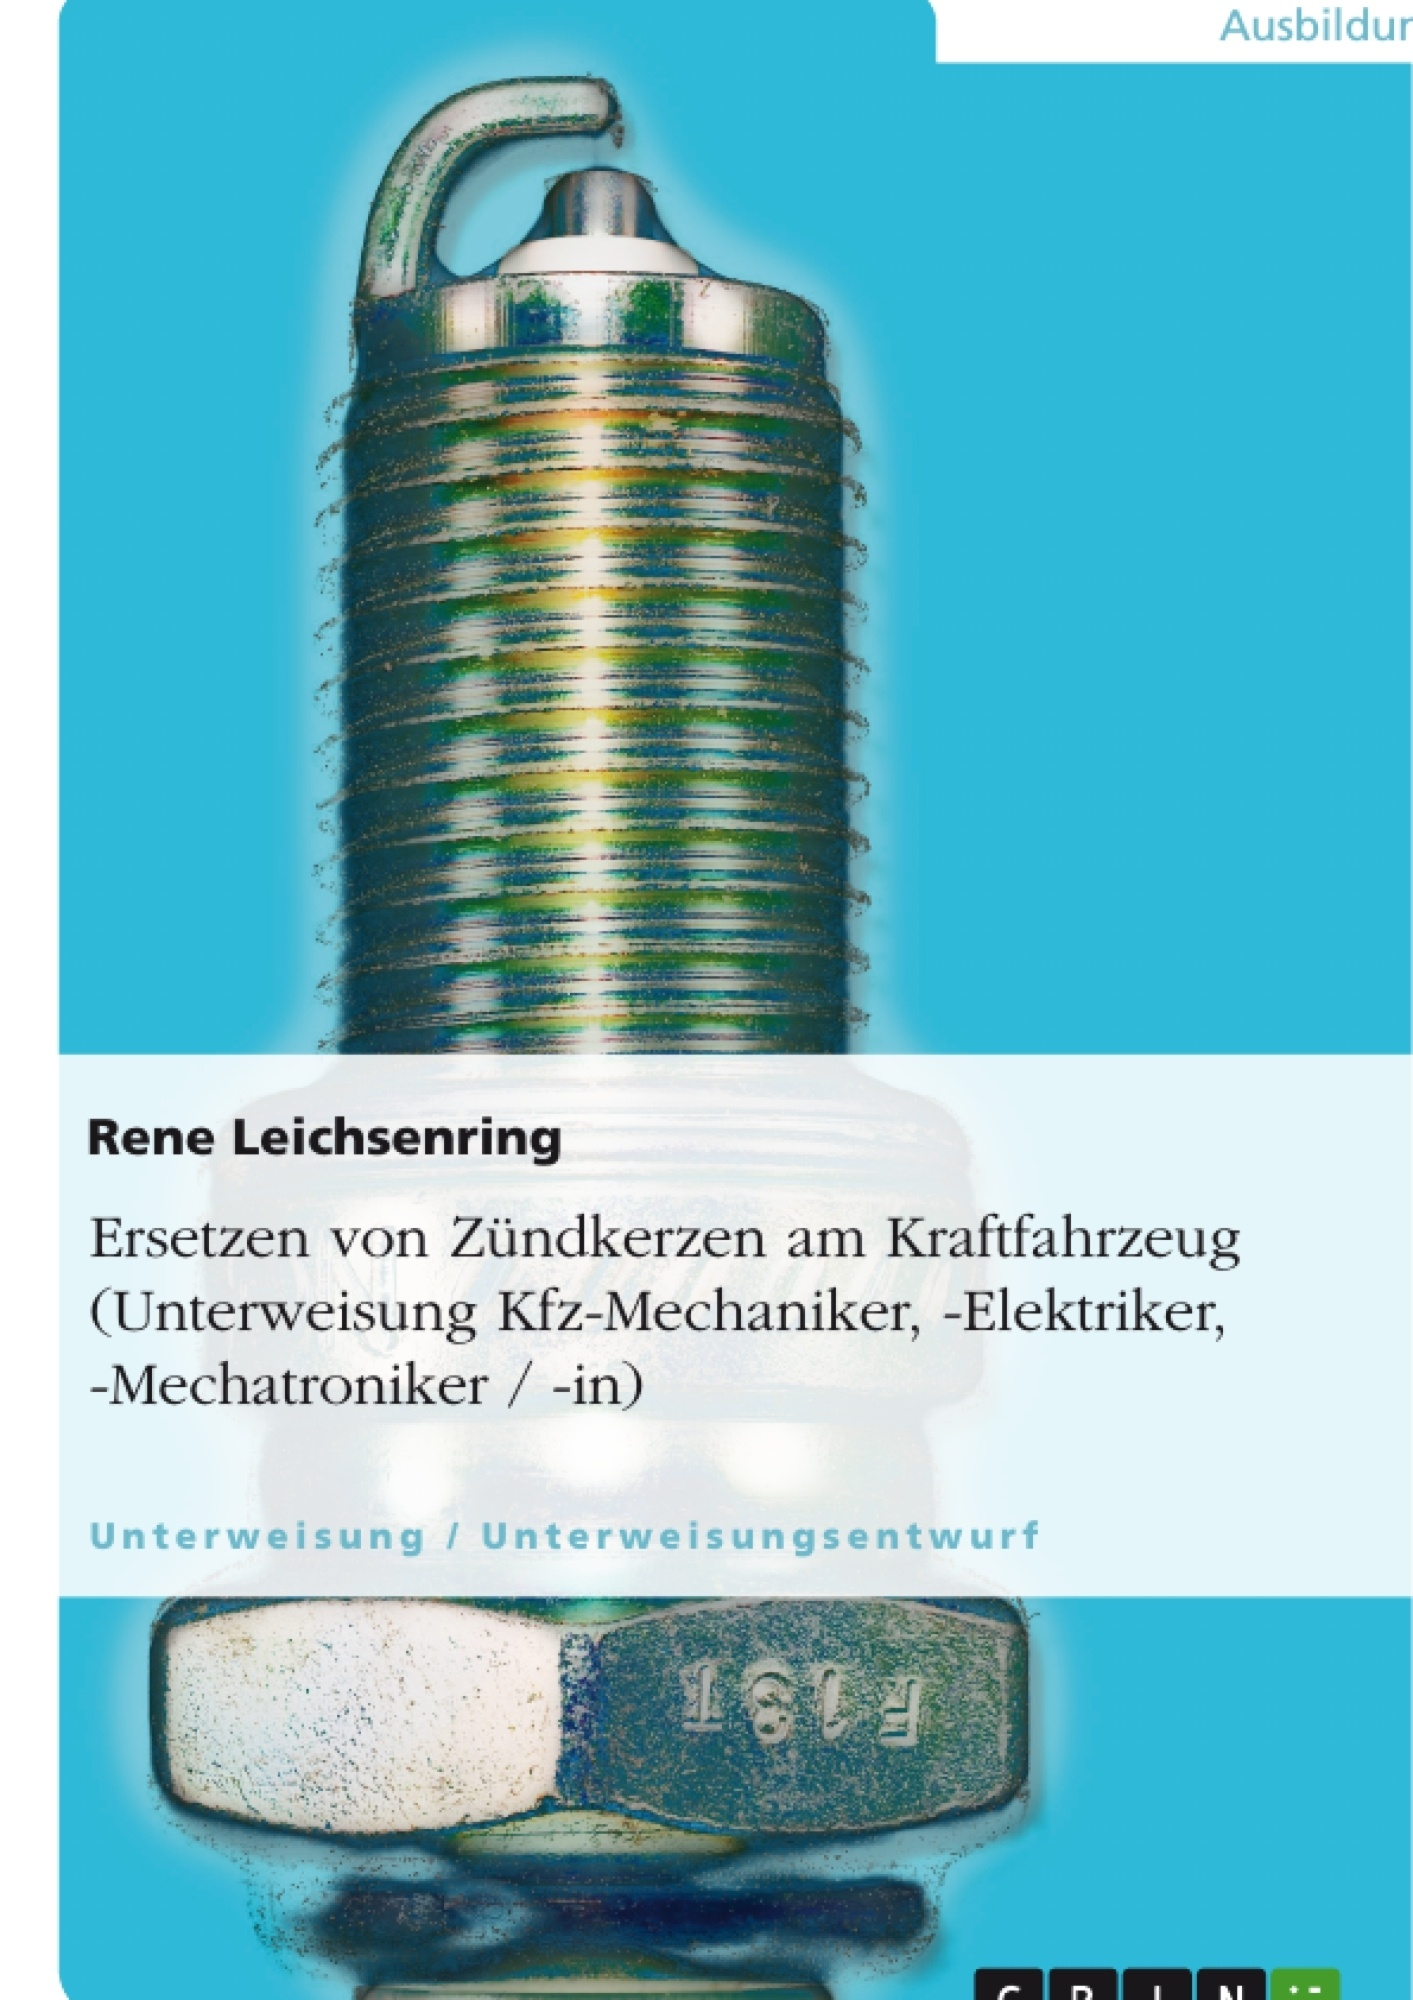 Titel: Ersetzen von Zündkerzen am Kraftfahrzeug (Unterweisung Kfz-Mechaniker, -Elektriker, -Mechatroniker / -in)